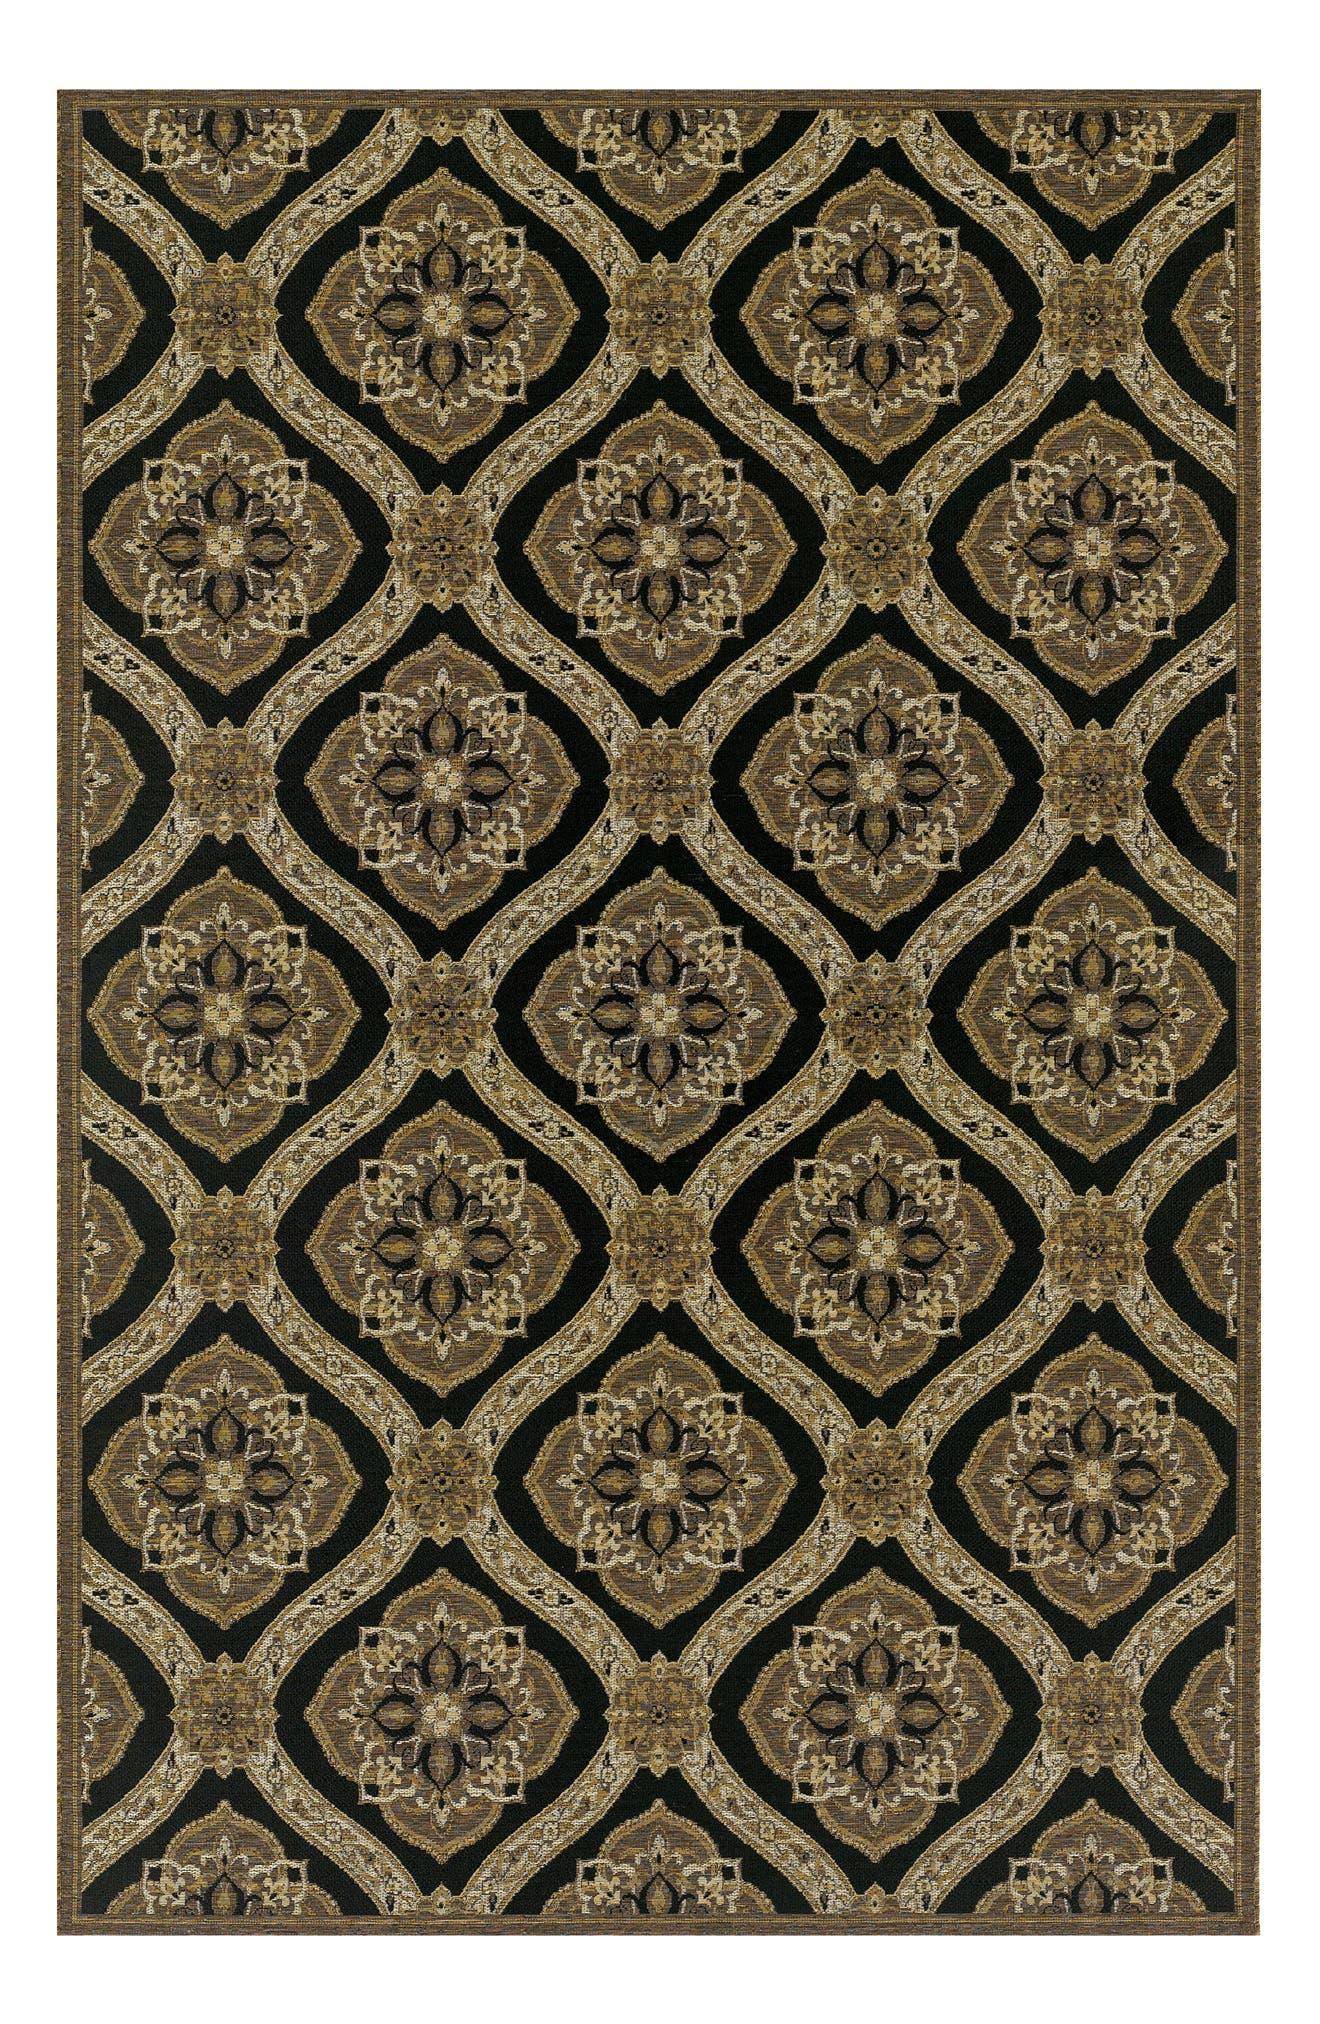 Napoli Indoor/Outdoor Rug,                         Main,                         color, Black/ Gold